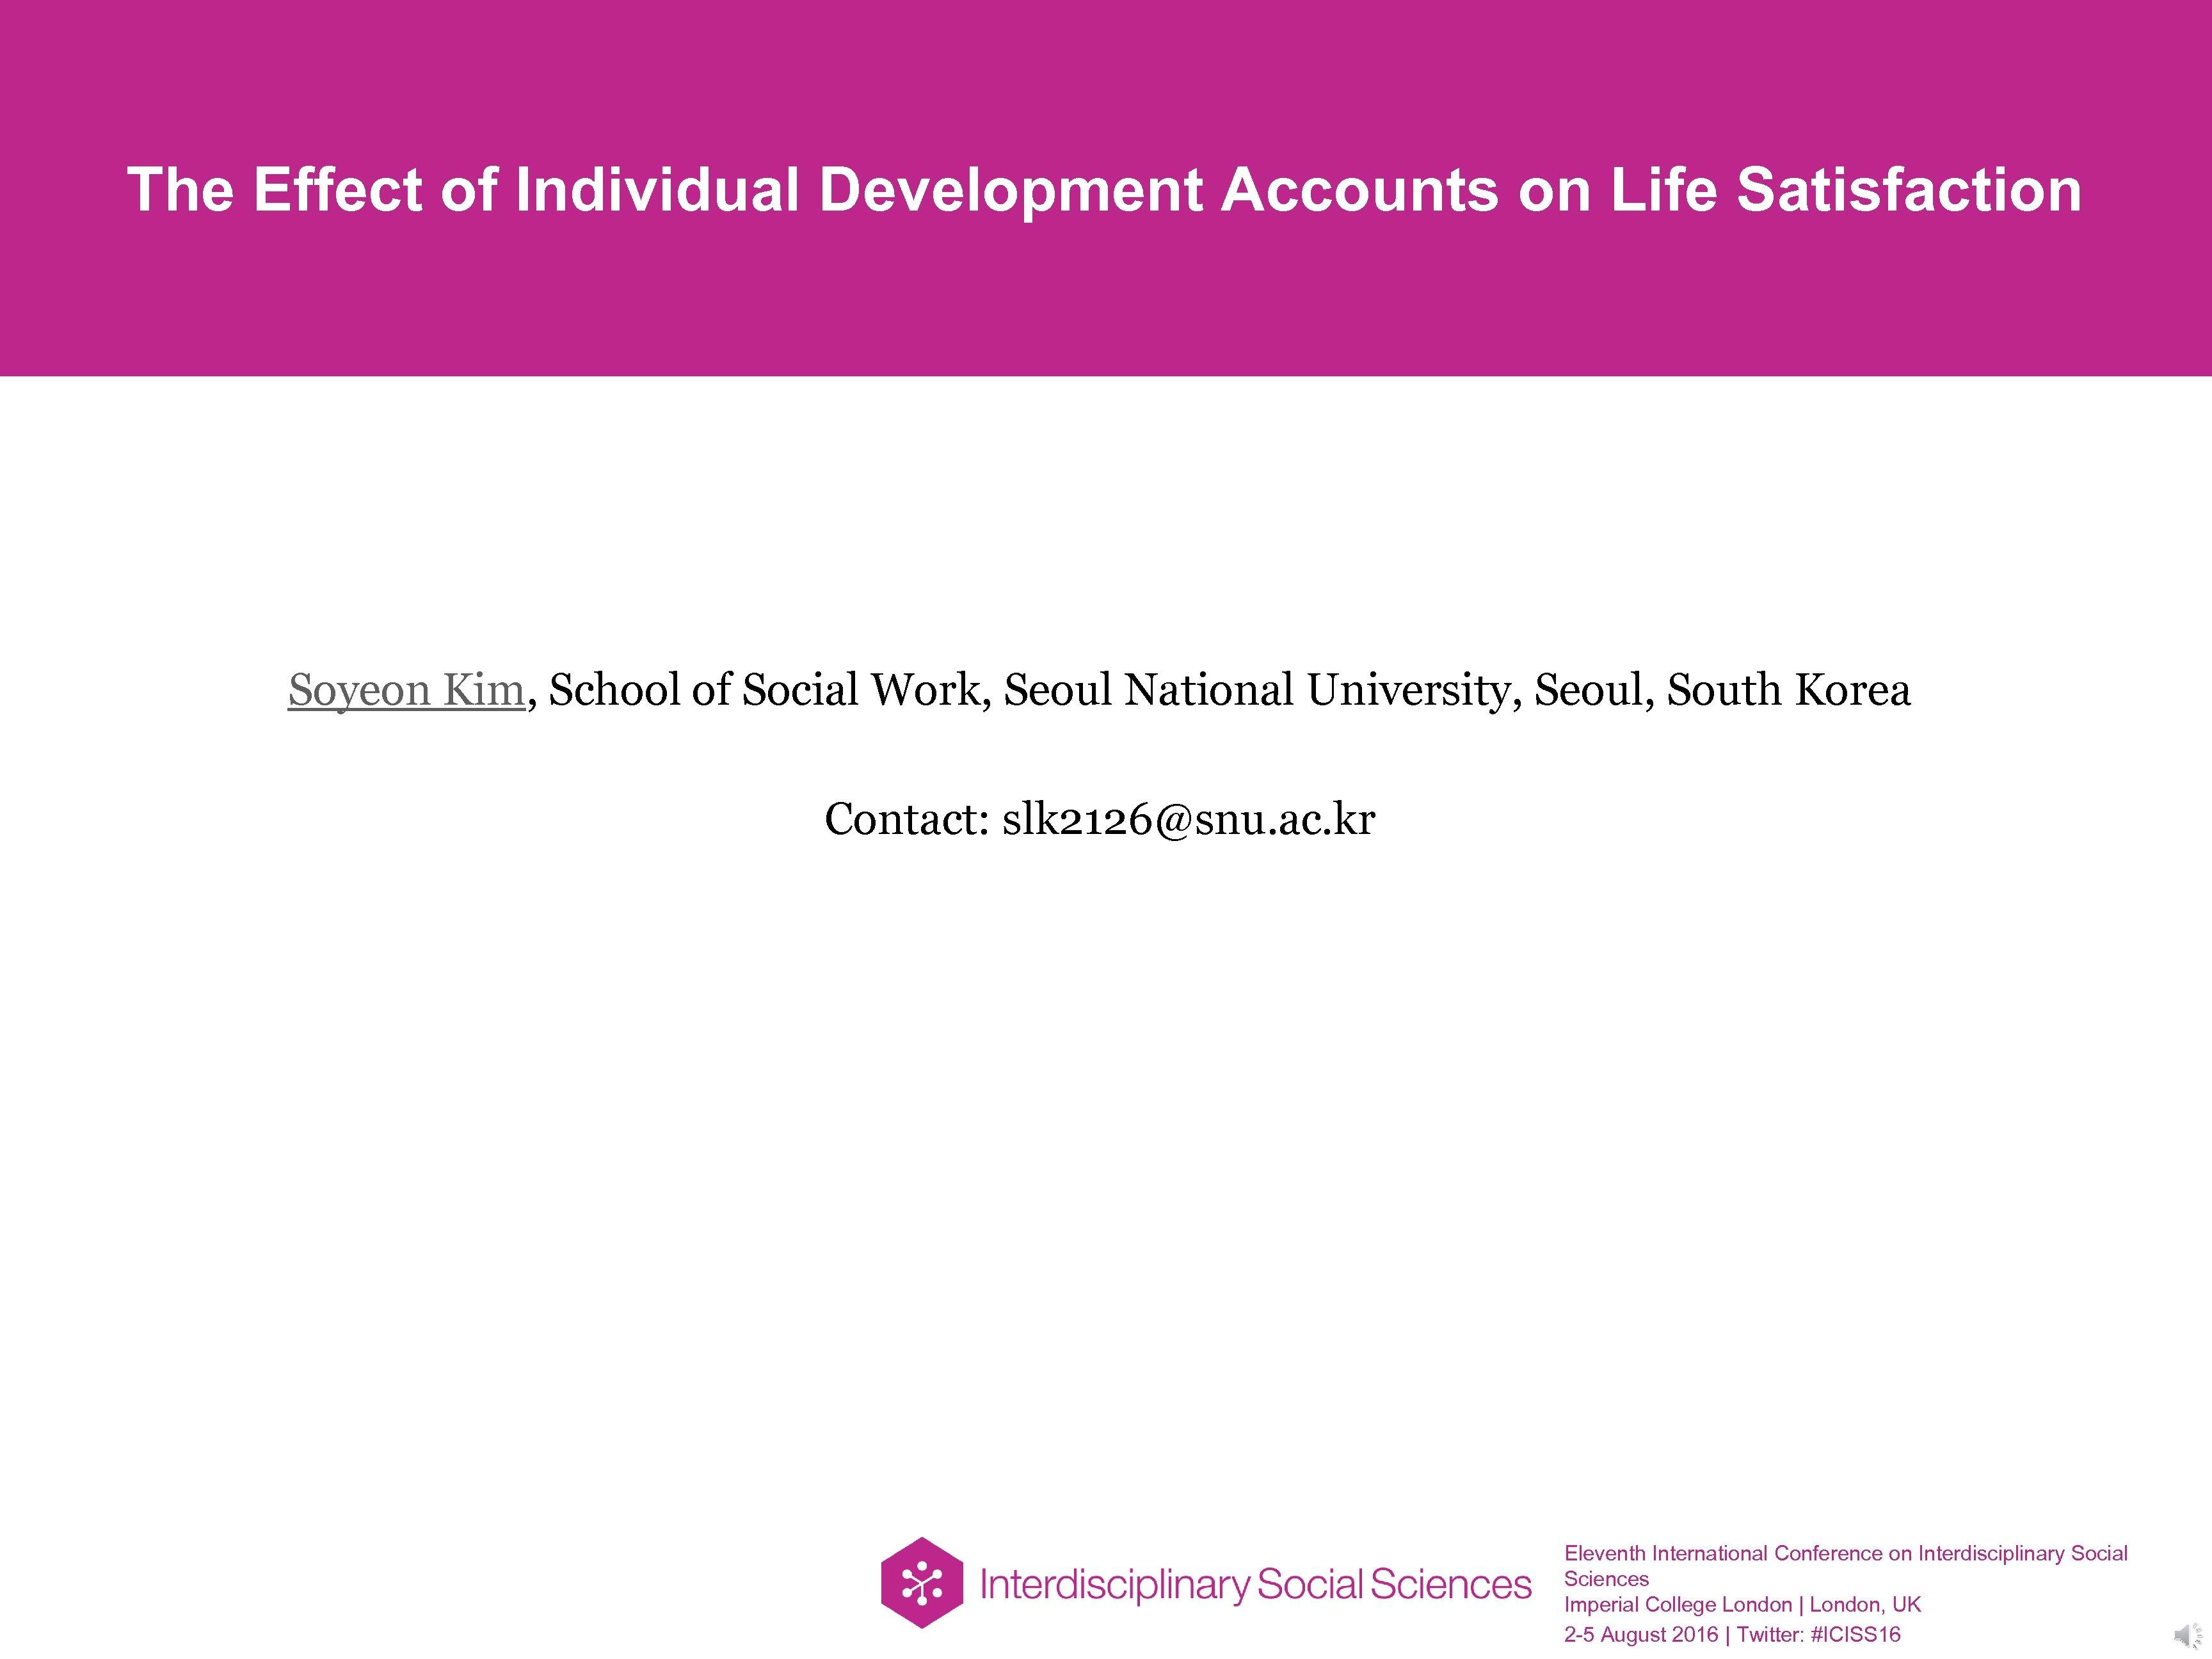 The Effect of Individual Development Accounts on Life Satisfaction Soyeon Kim, School of Social